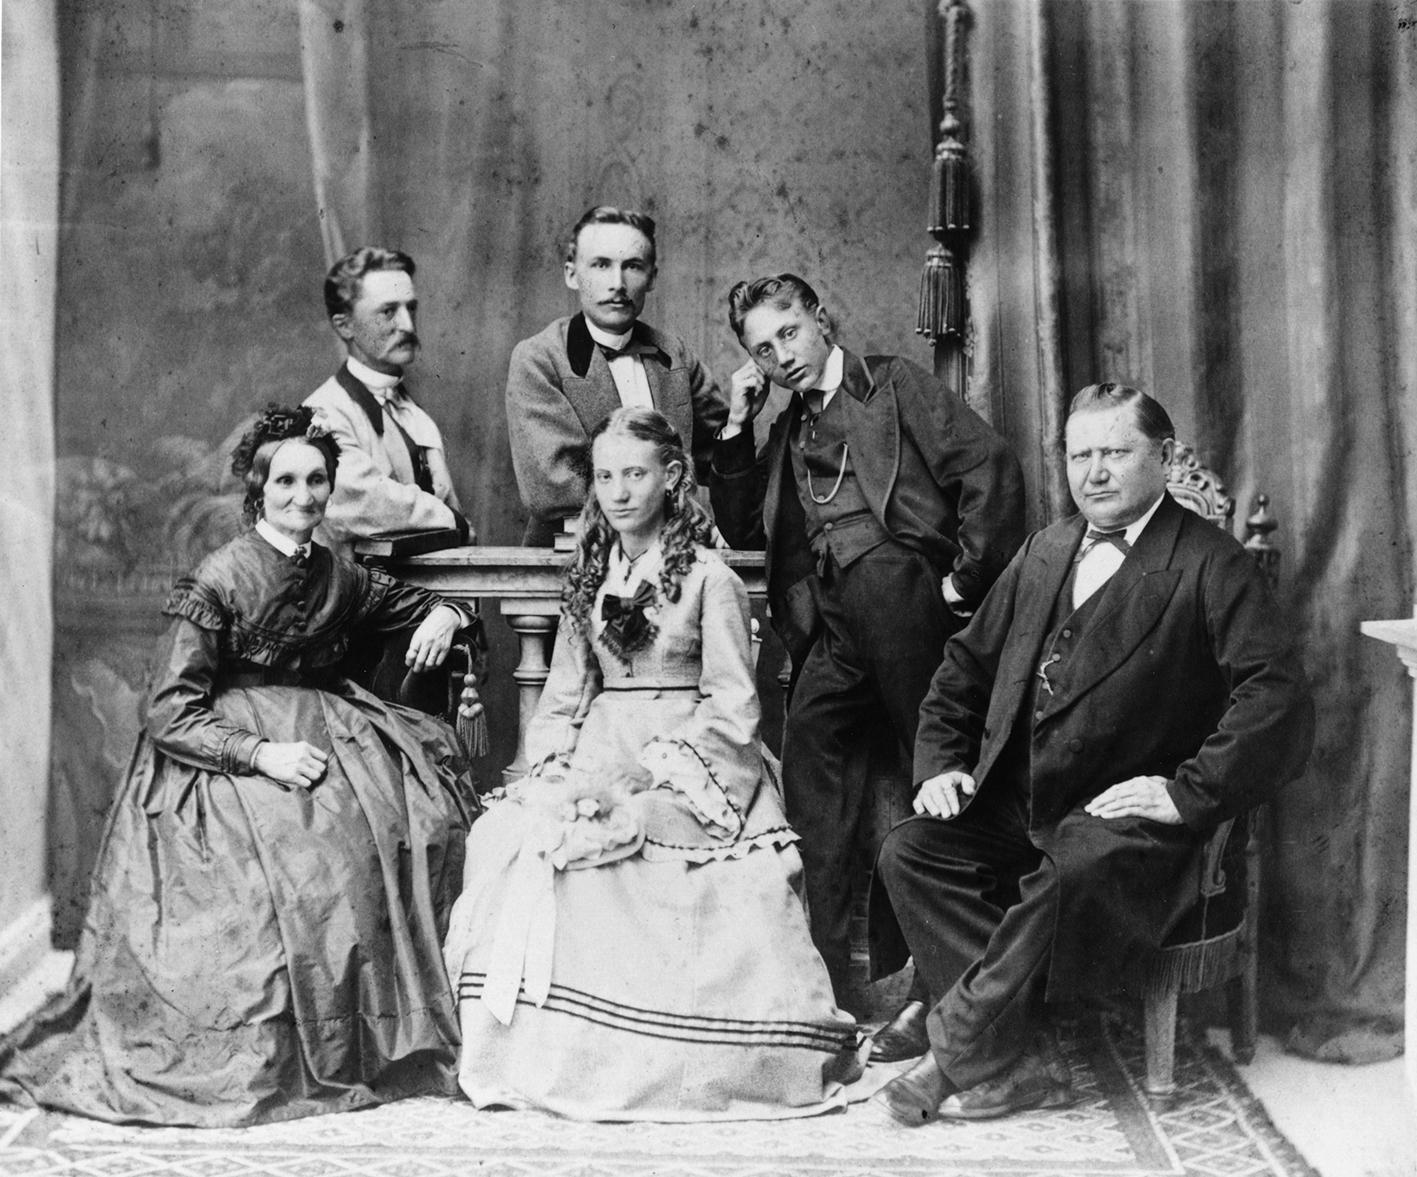 1870 noin . Kaupunginvouti Alexander Wickholmin perhe. Eturivissä vas. Erika Sofia Wickholm (ent. Justén, o.s. Hedberg), lapset Augusta (s. 1856) ja Alexander (s. 1853), Alexander Fridolf Wickholm (s. 1823). Takana pojat Erika Wickholmin edellisestä avioliitosta Karl (s. 1840) ja Franz (s. 1845) Justén.